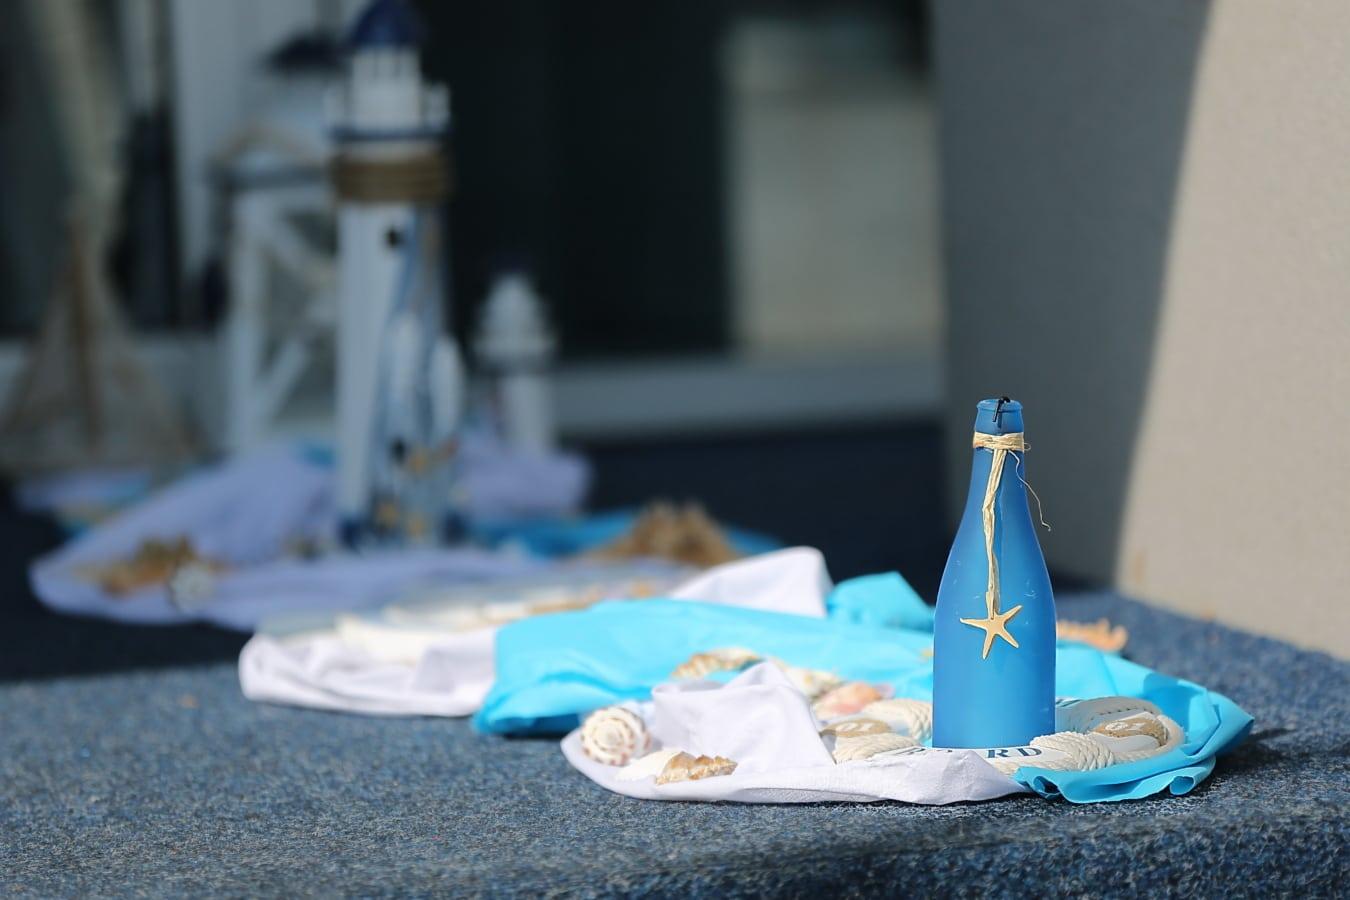 blue, bottle, seashell, handmade, still life, summer season, table, decoration